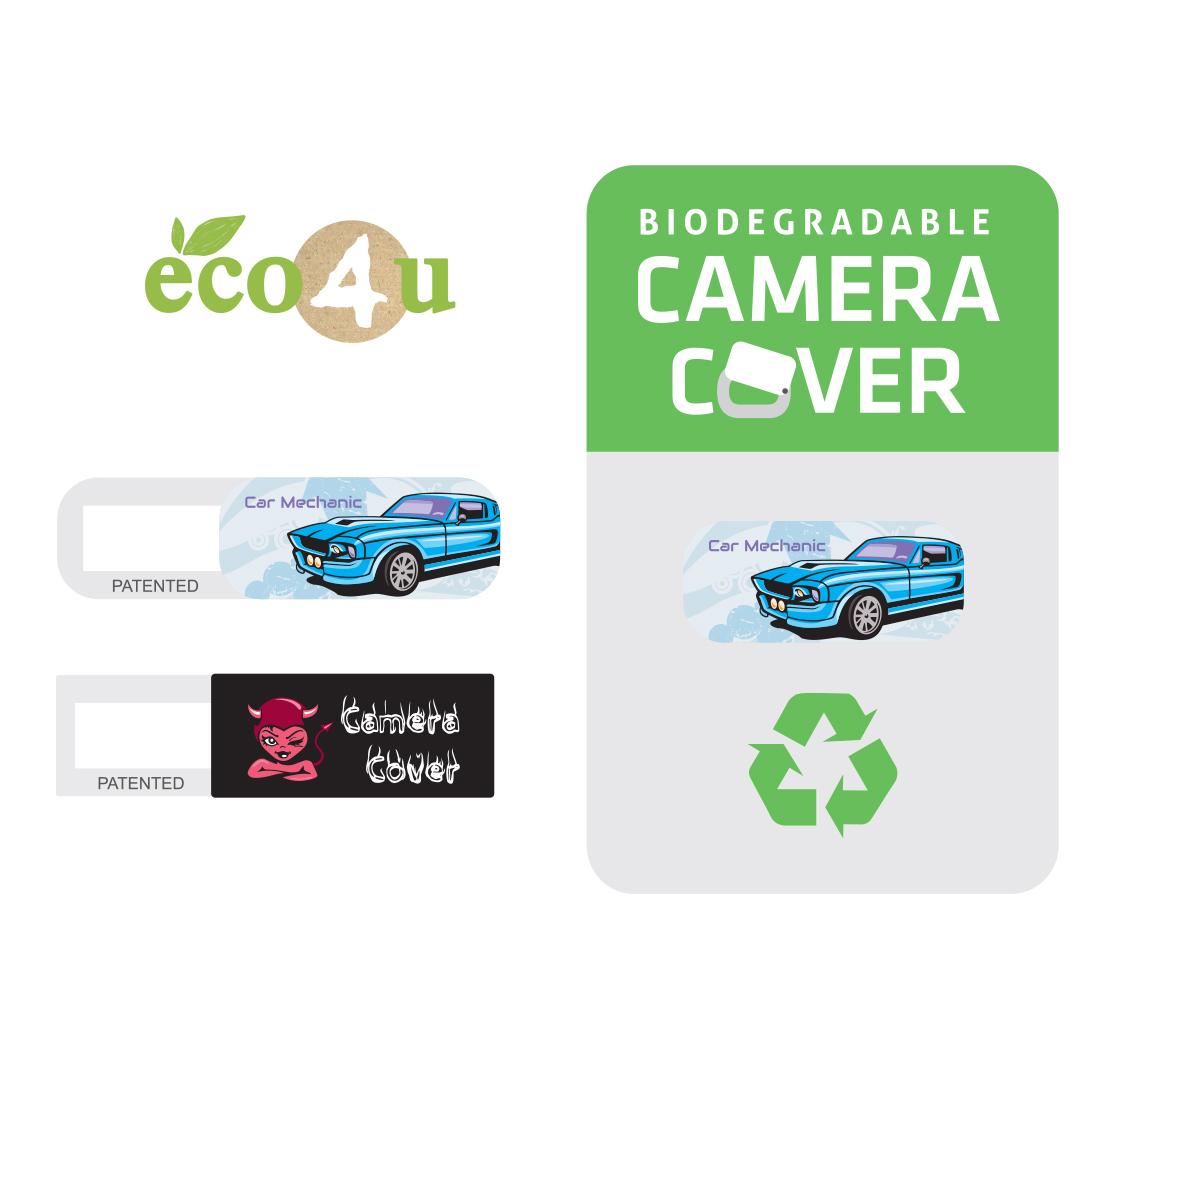 Biodegradable camera cover